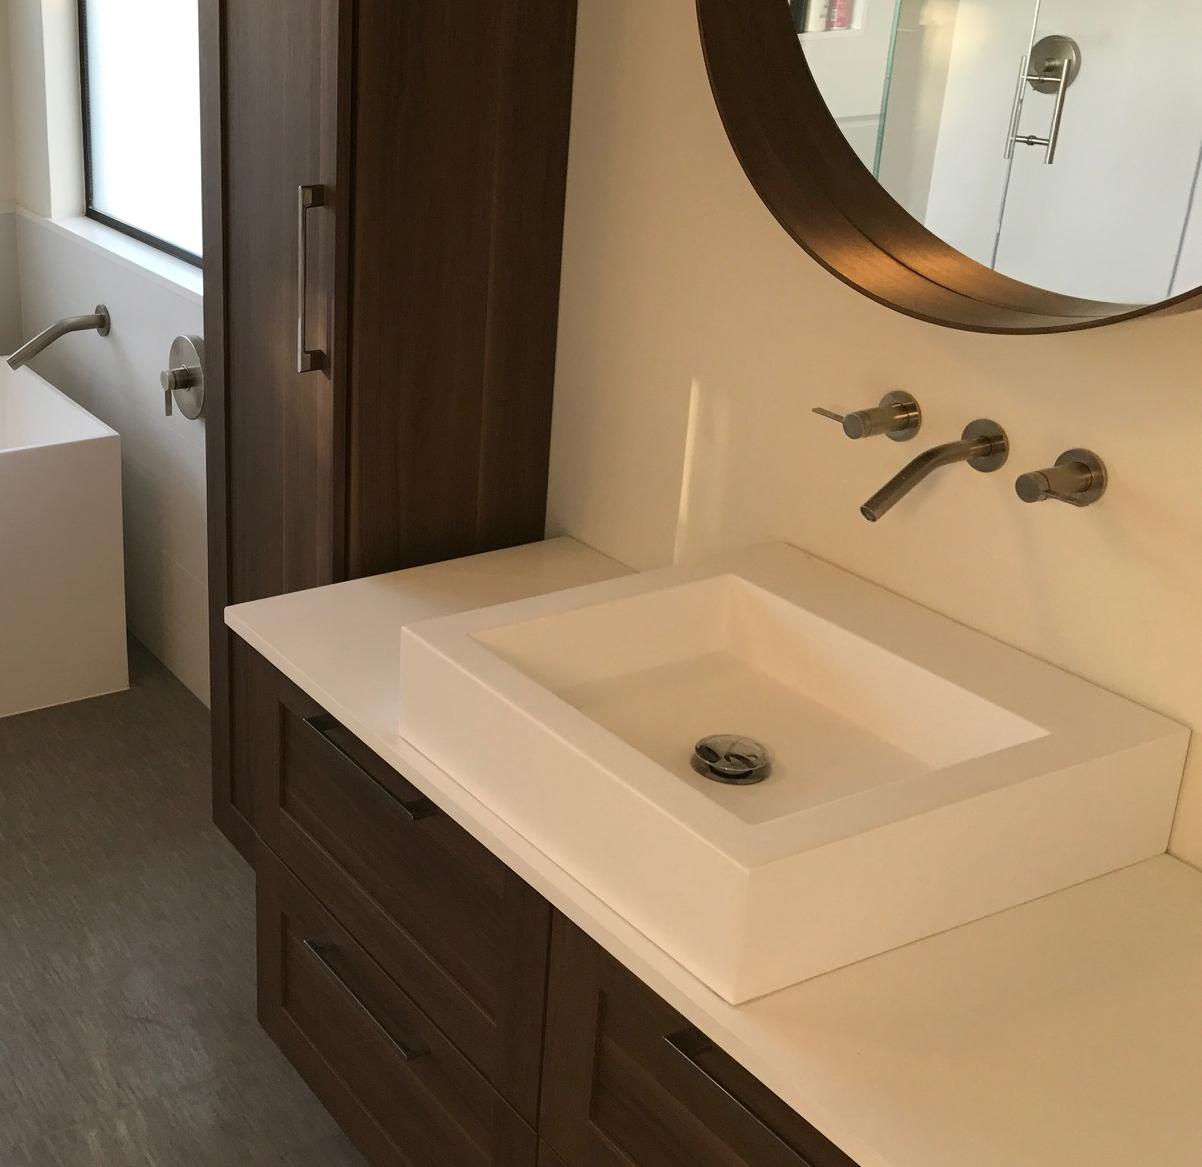 Small Countertop Sink Model WB 05 M Badeloft USA